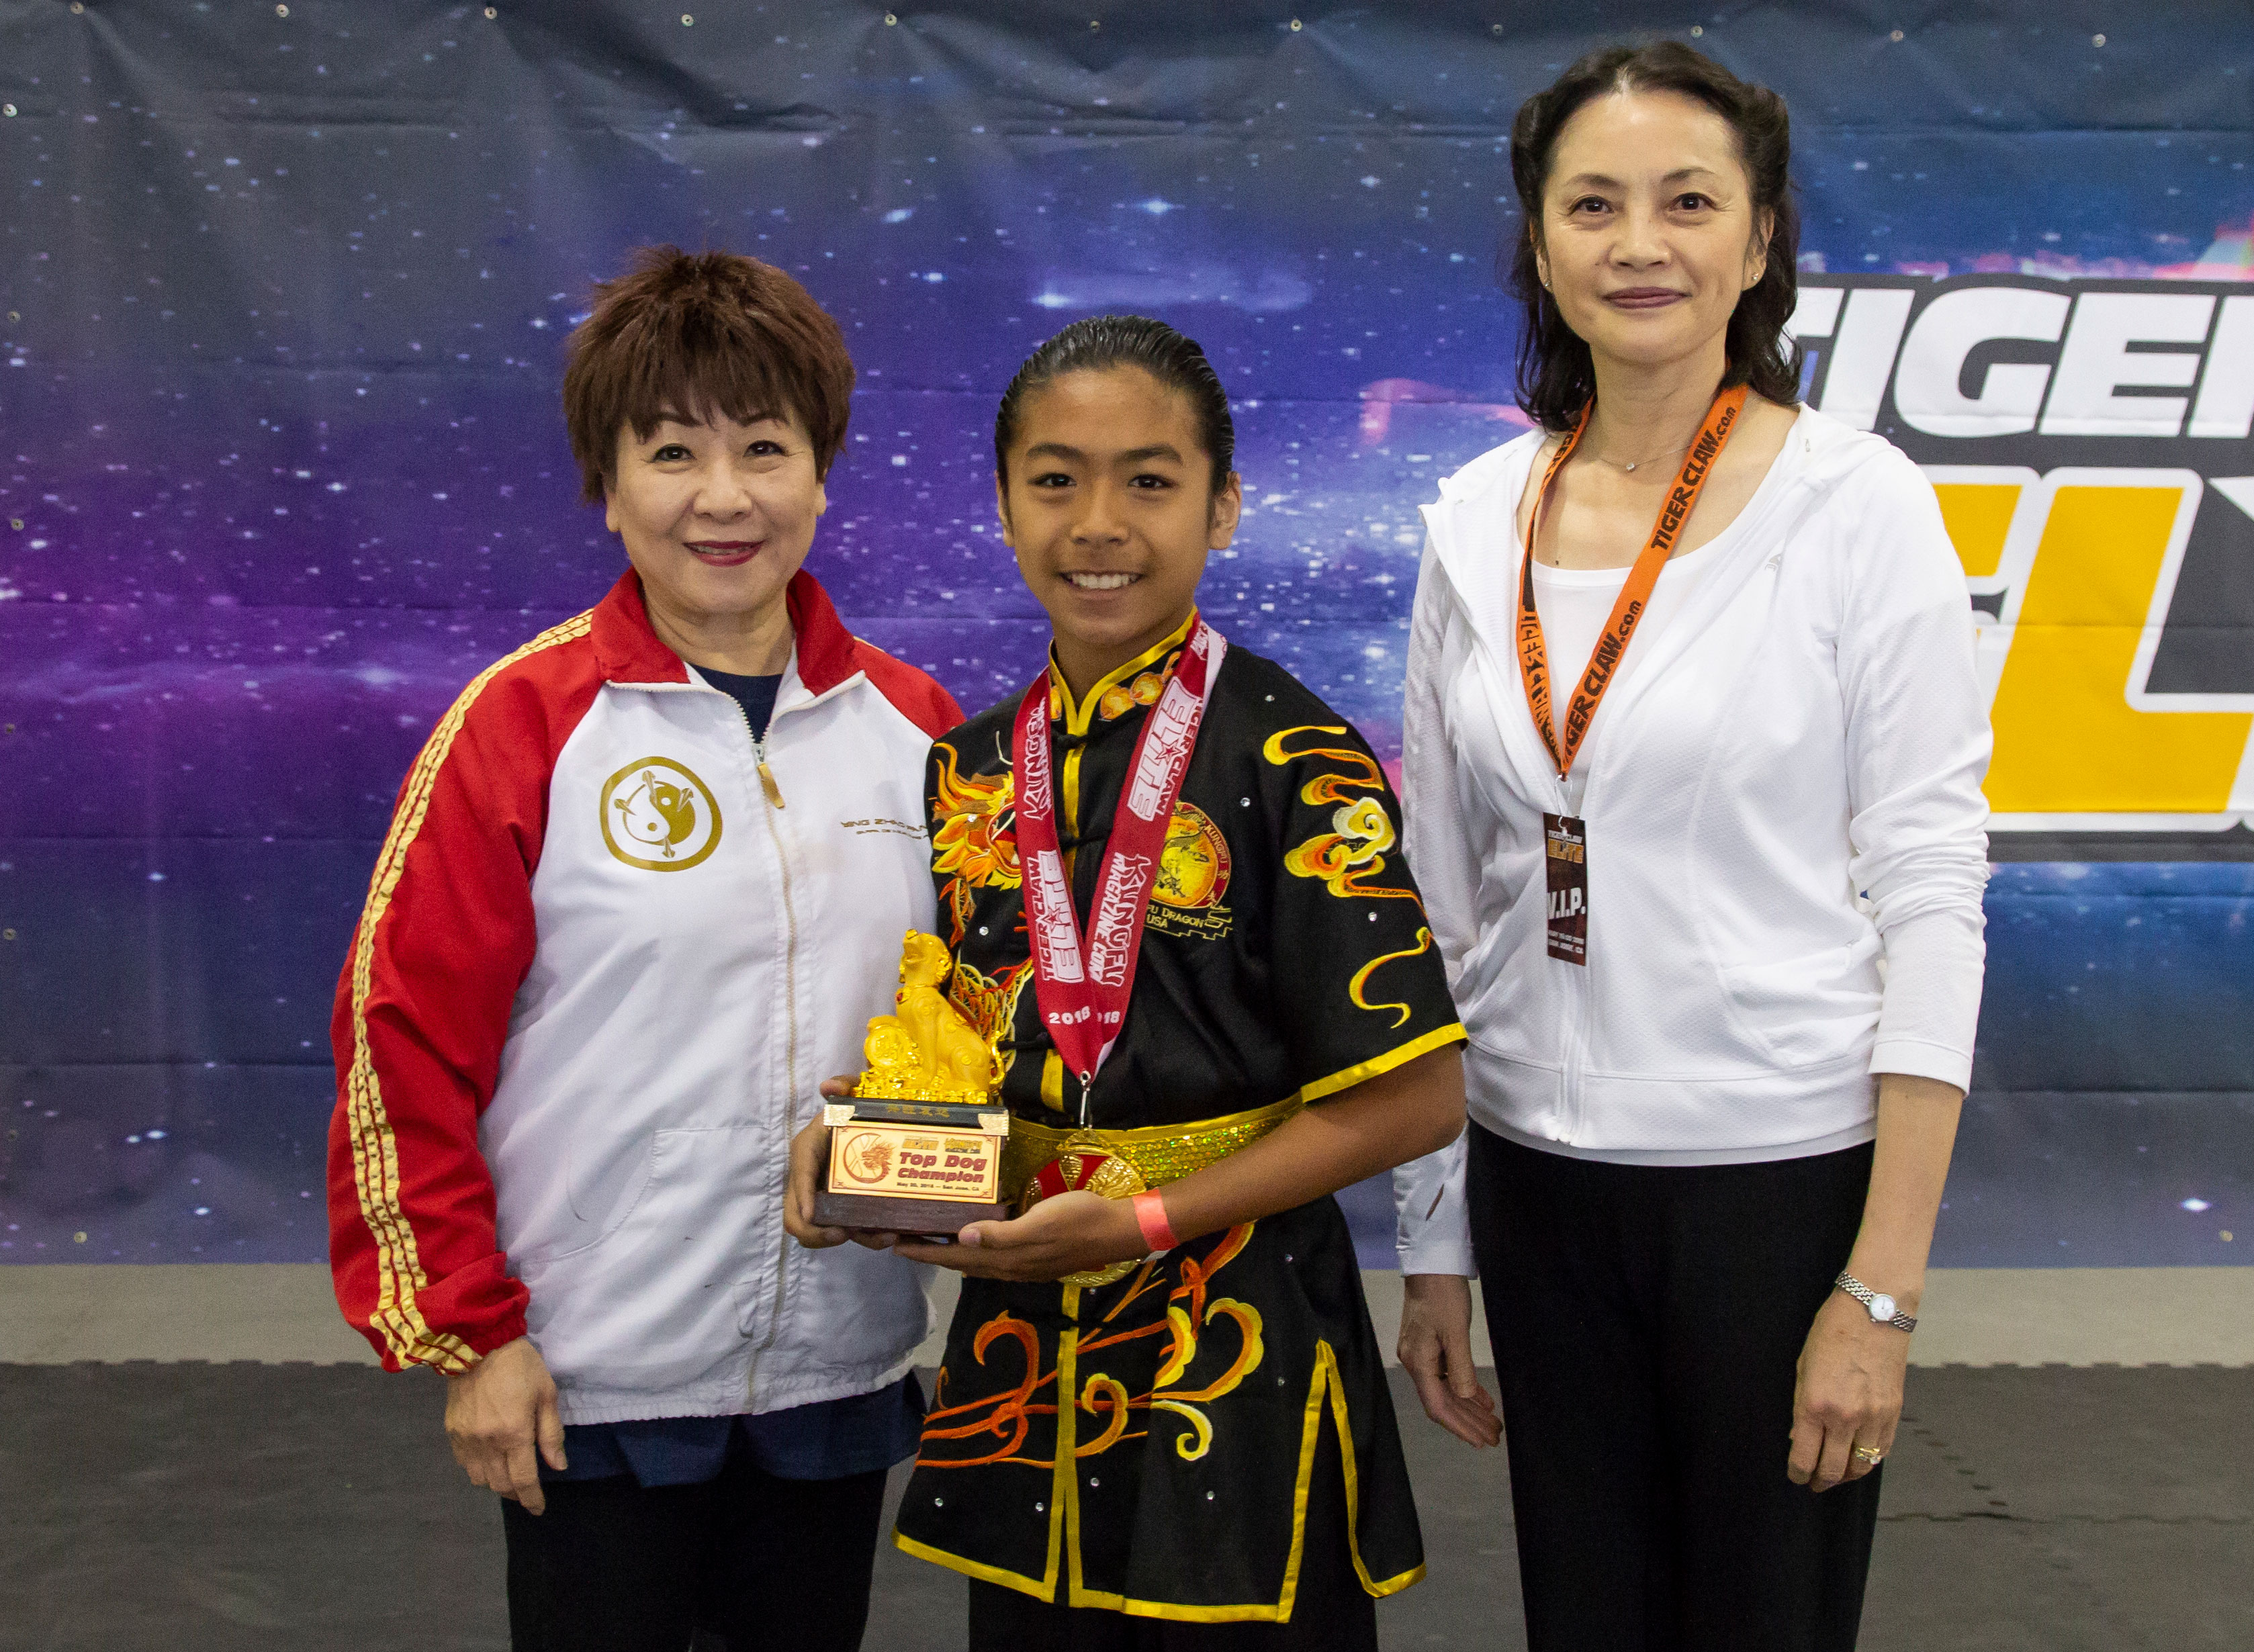 L-R: Grandmaster Lily Lau, & Master grace Wu-Monnat